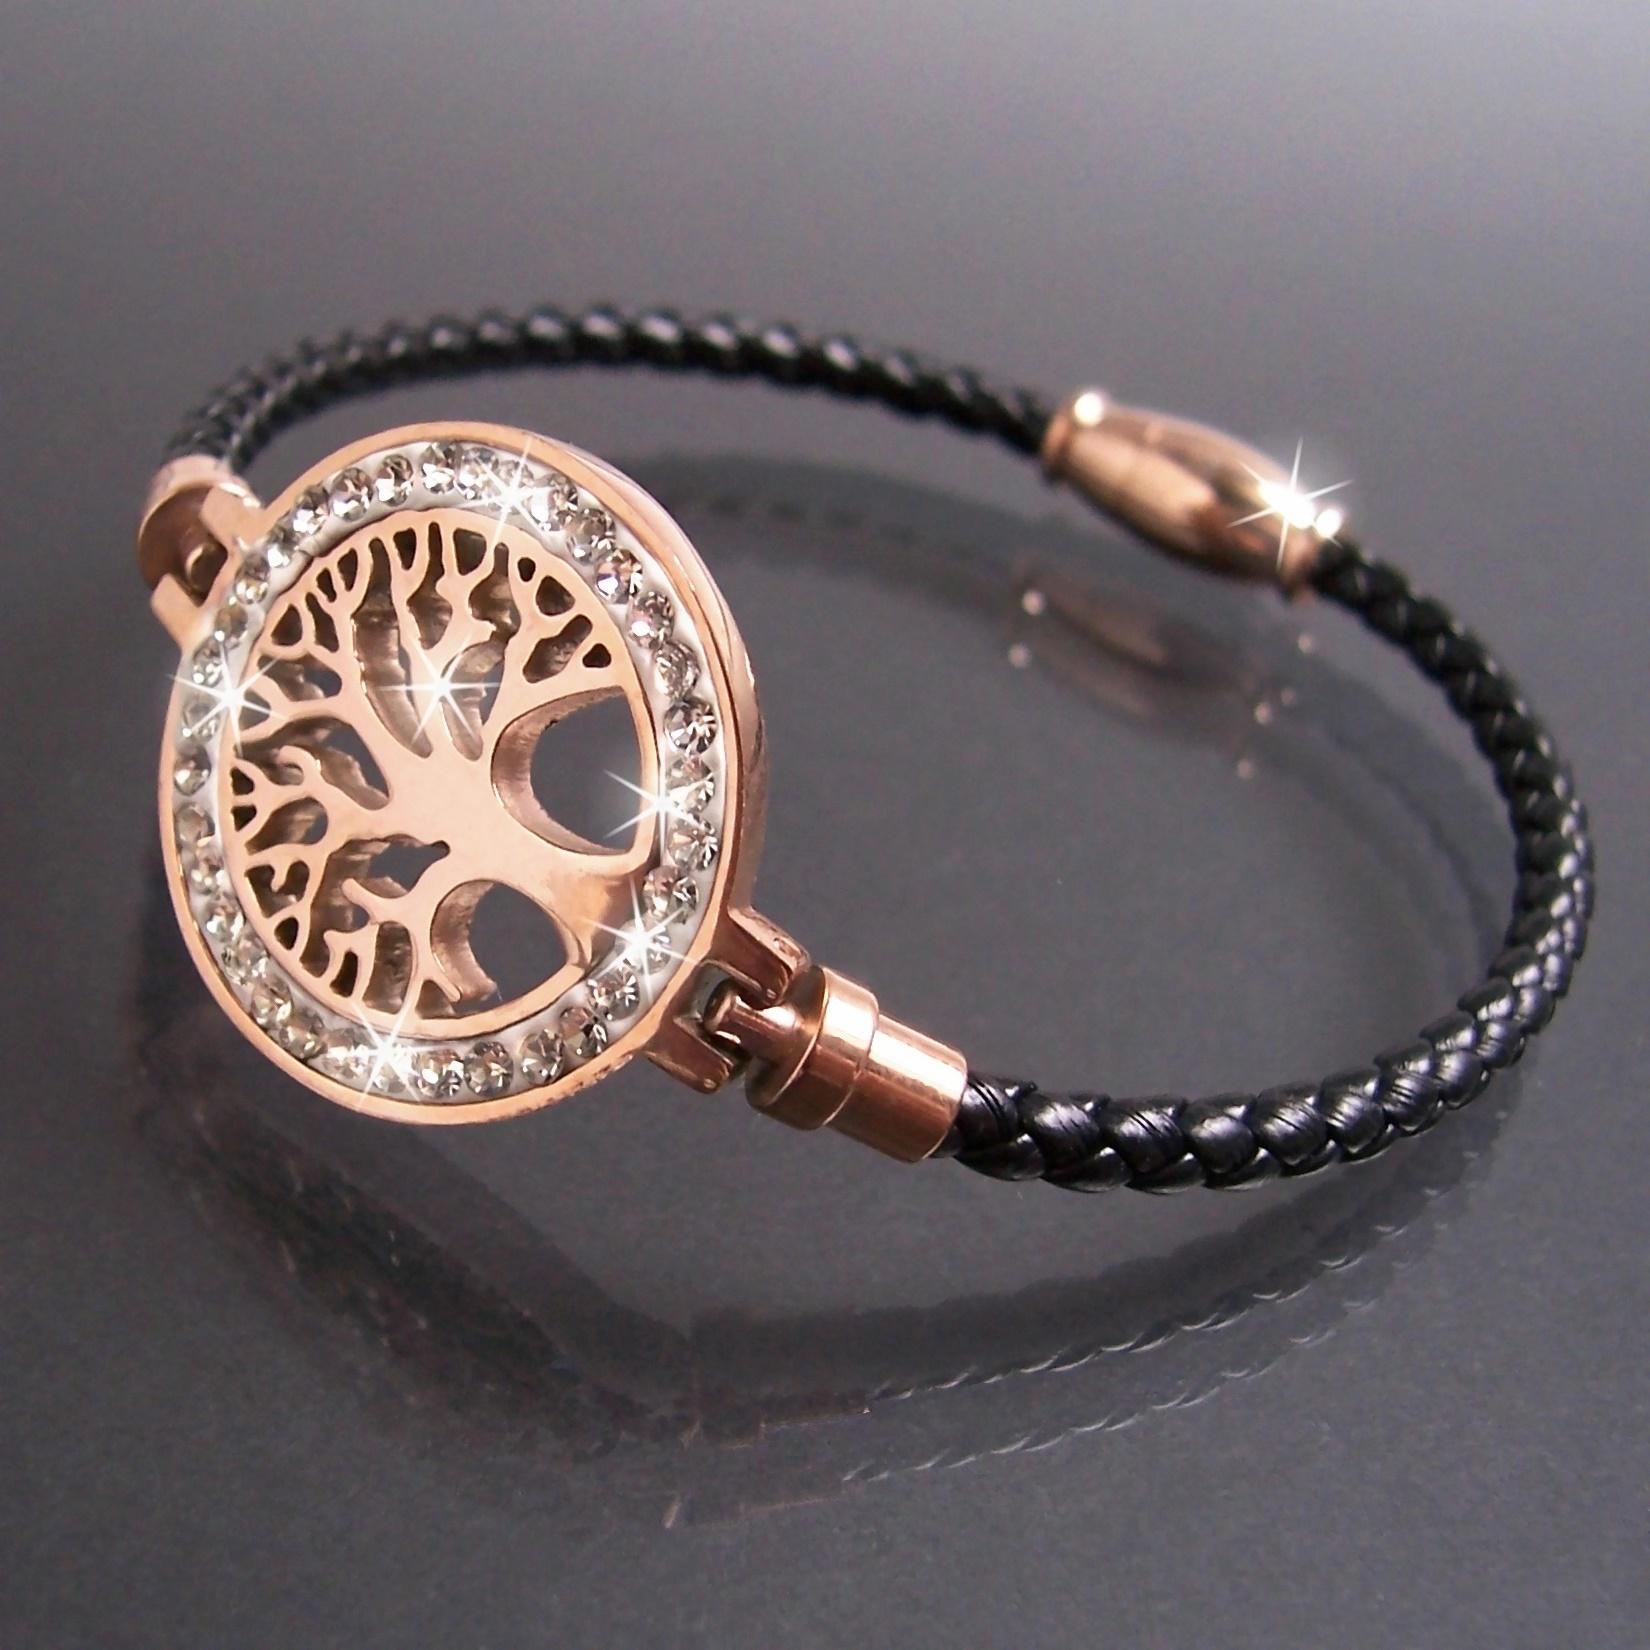 Armband Leder schwarz Edelstahl Lebensbaum rosé Strass Damen A77708